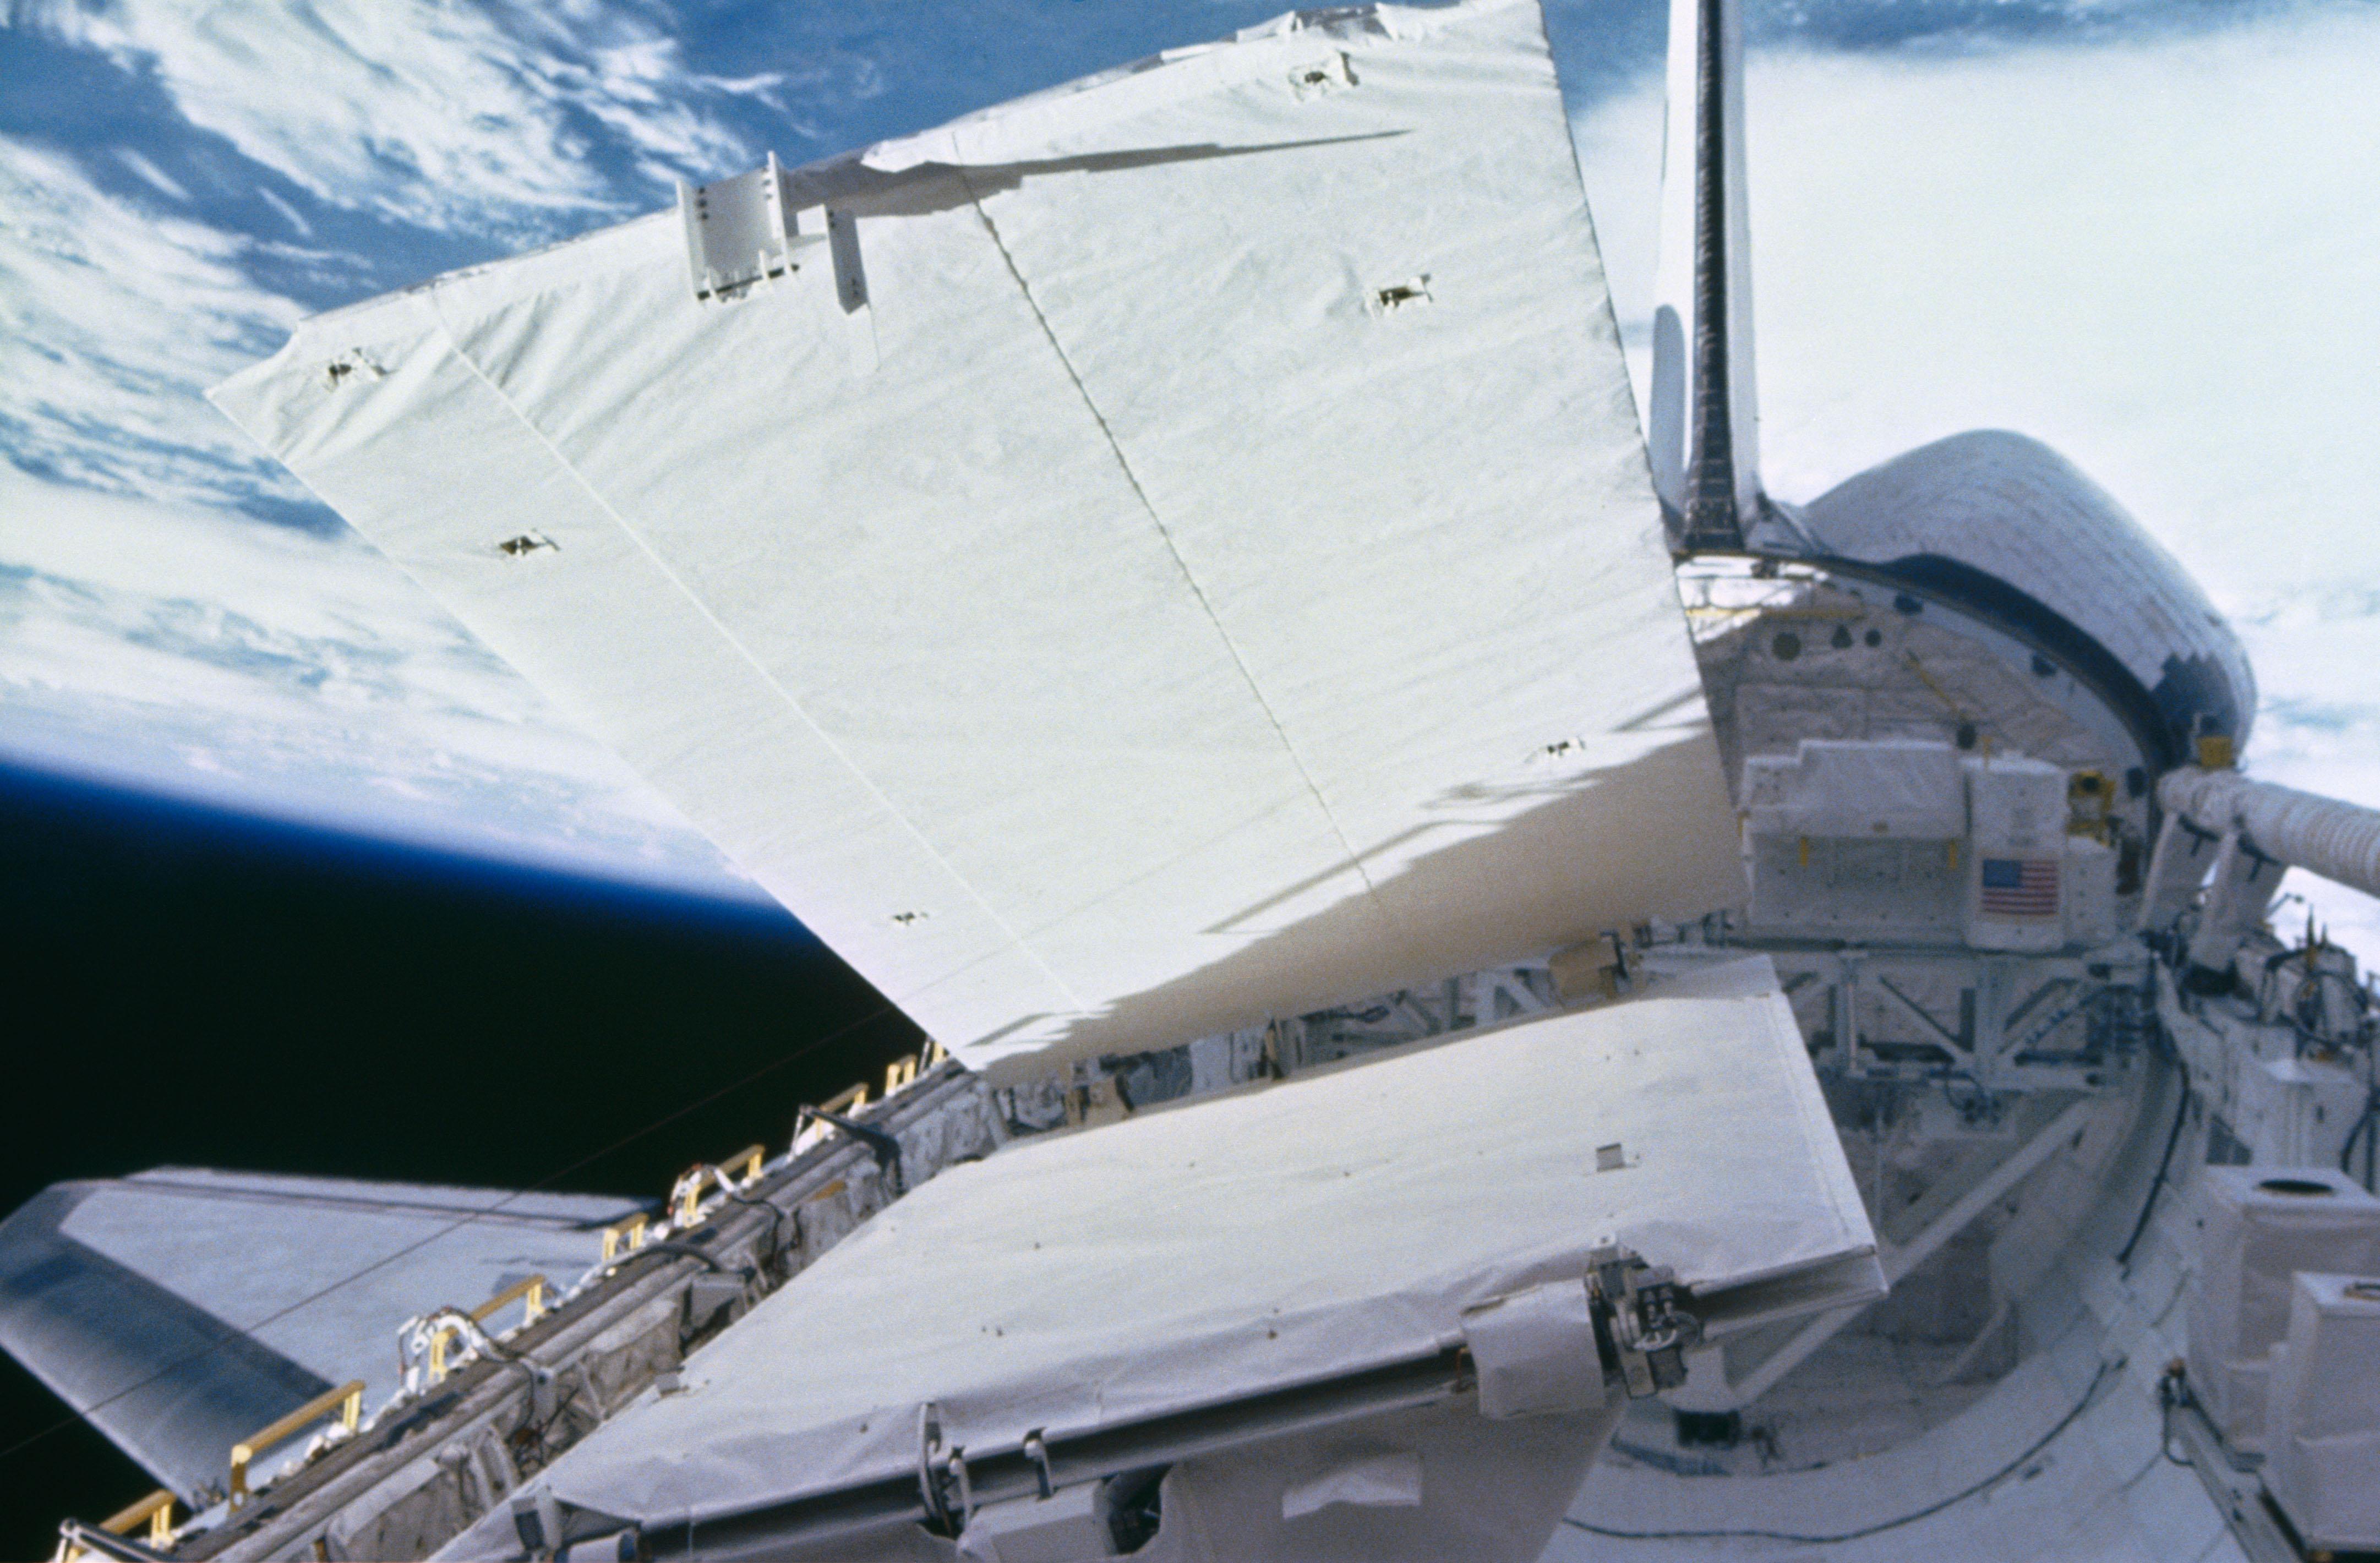 - Shuttle Challenger Oct 1984 Original Photo Nasa 41-g Onboard Scene Of Eva